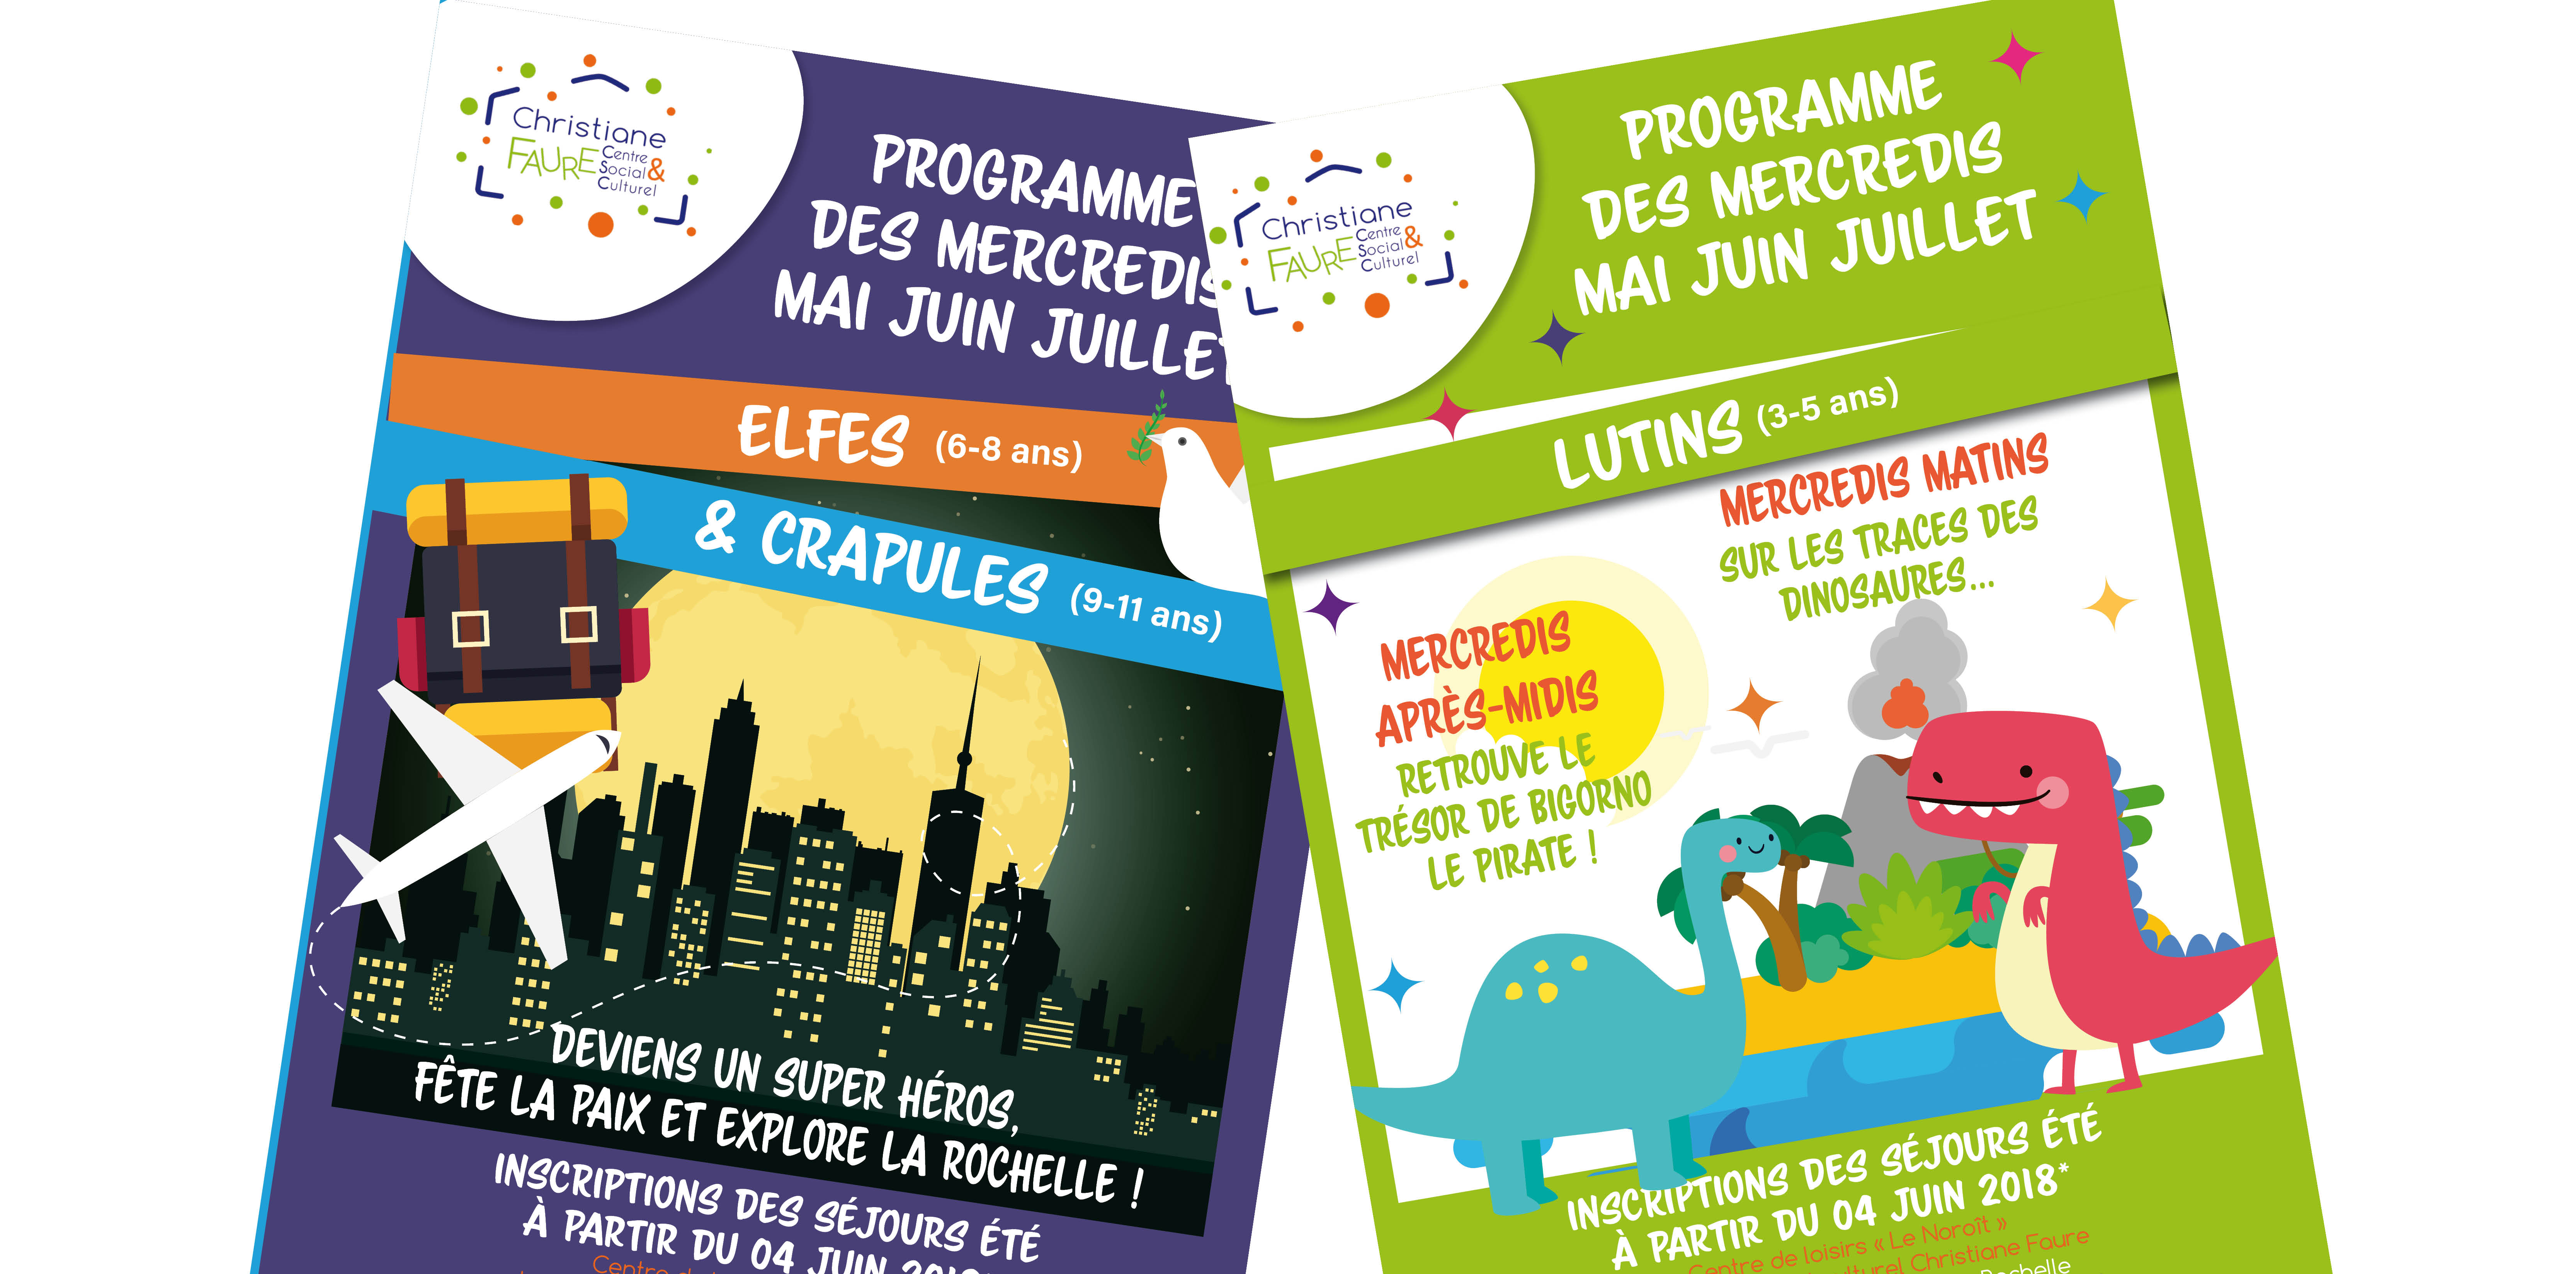 Programmes des mercredis mai juin juillet 2018